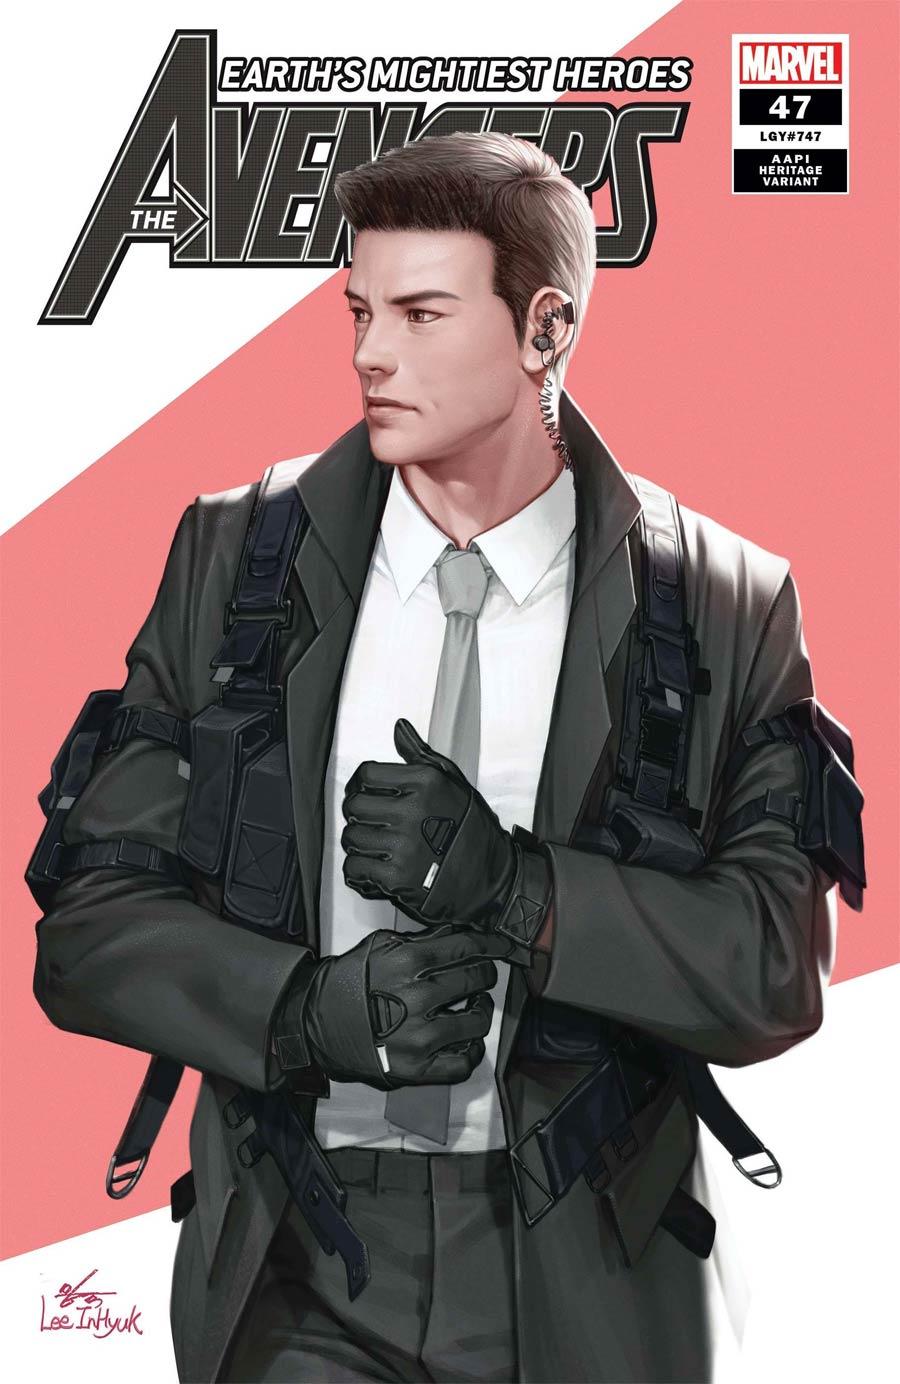 Avengers Vol 7 #47 Cover B Variant Inhyuk Lee AAPI Heritage Cover